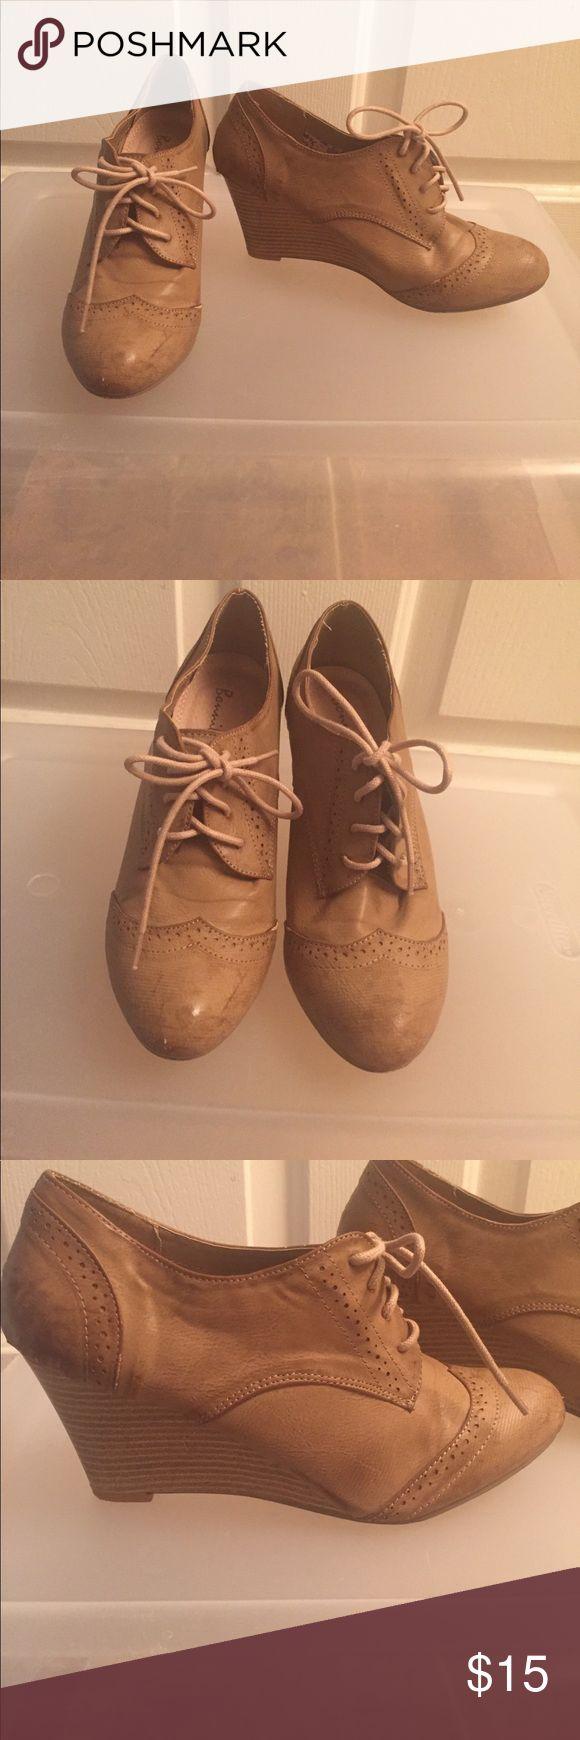 Tan Oxford wedges size 8! Lightly worn Tan Oxford wedges size 8 lightly worn - too tight on me Shoes Wedges